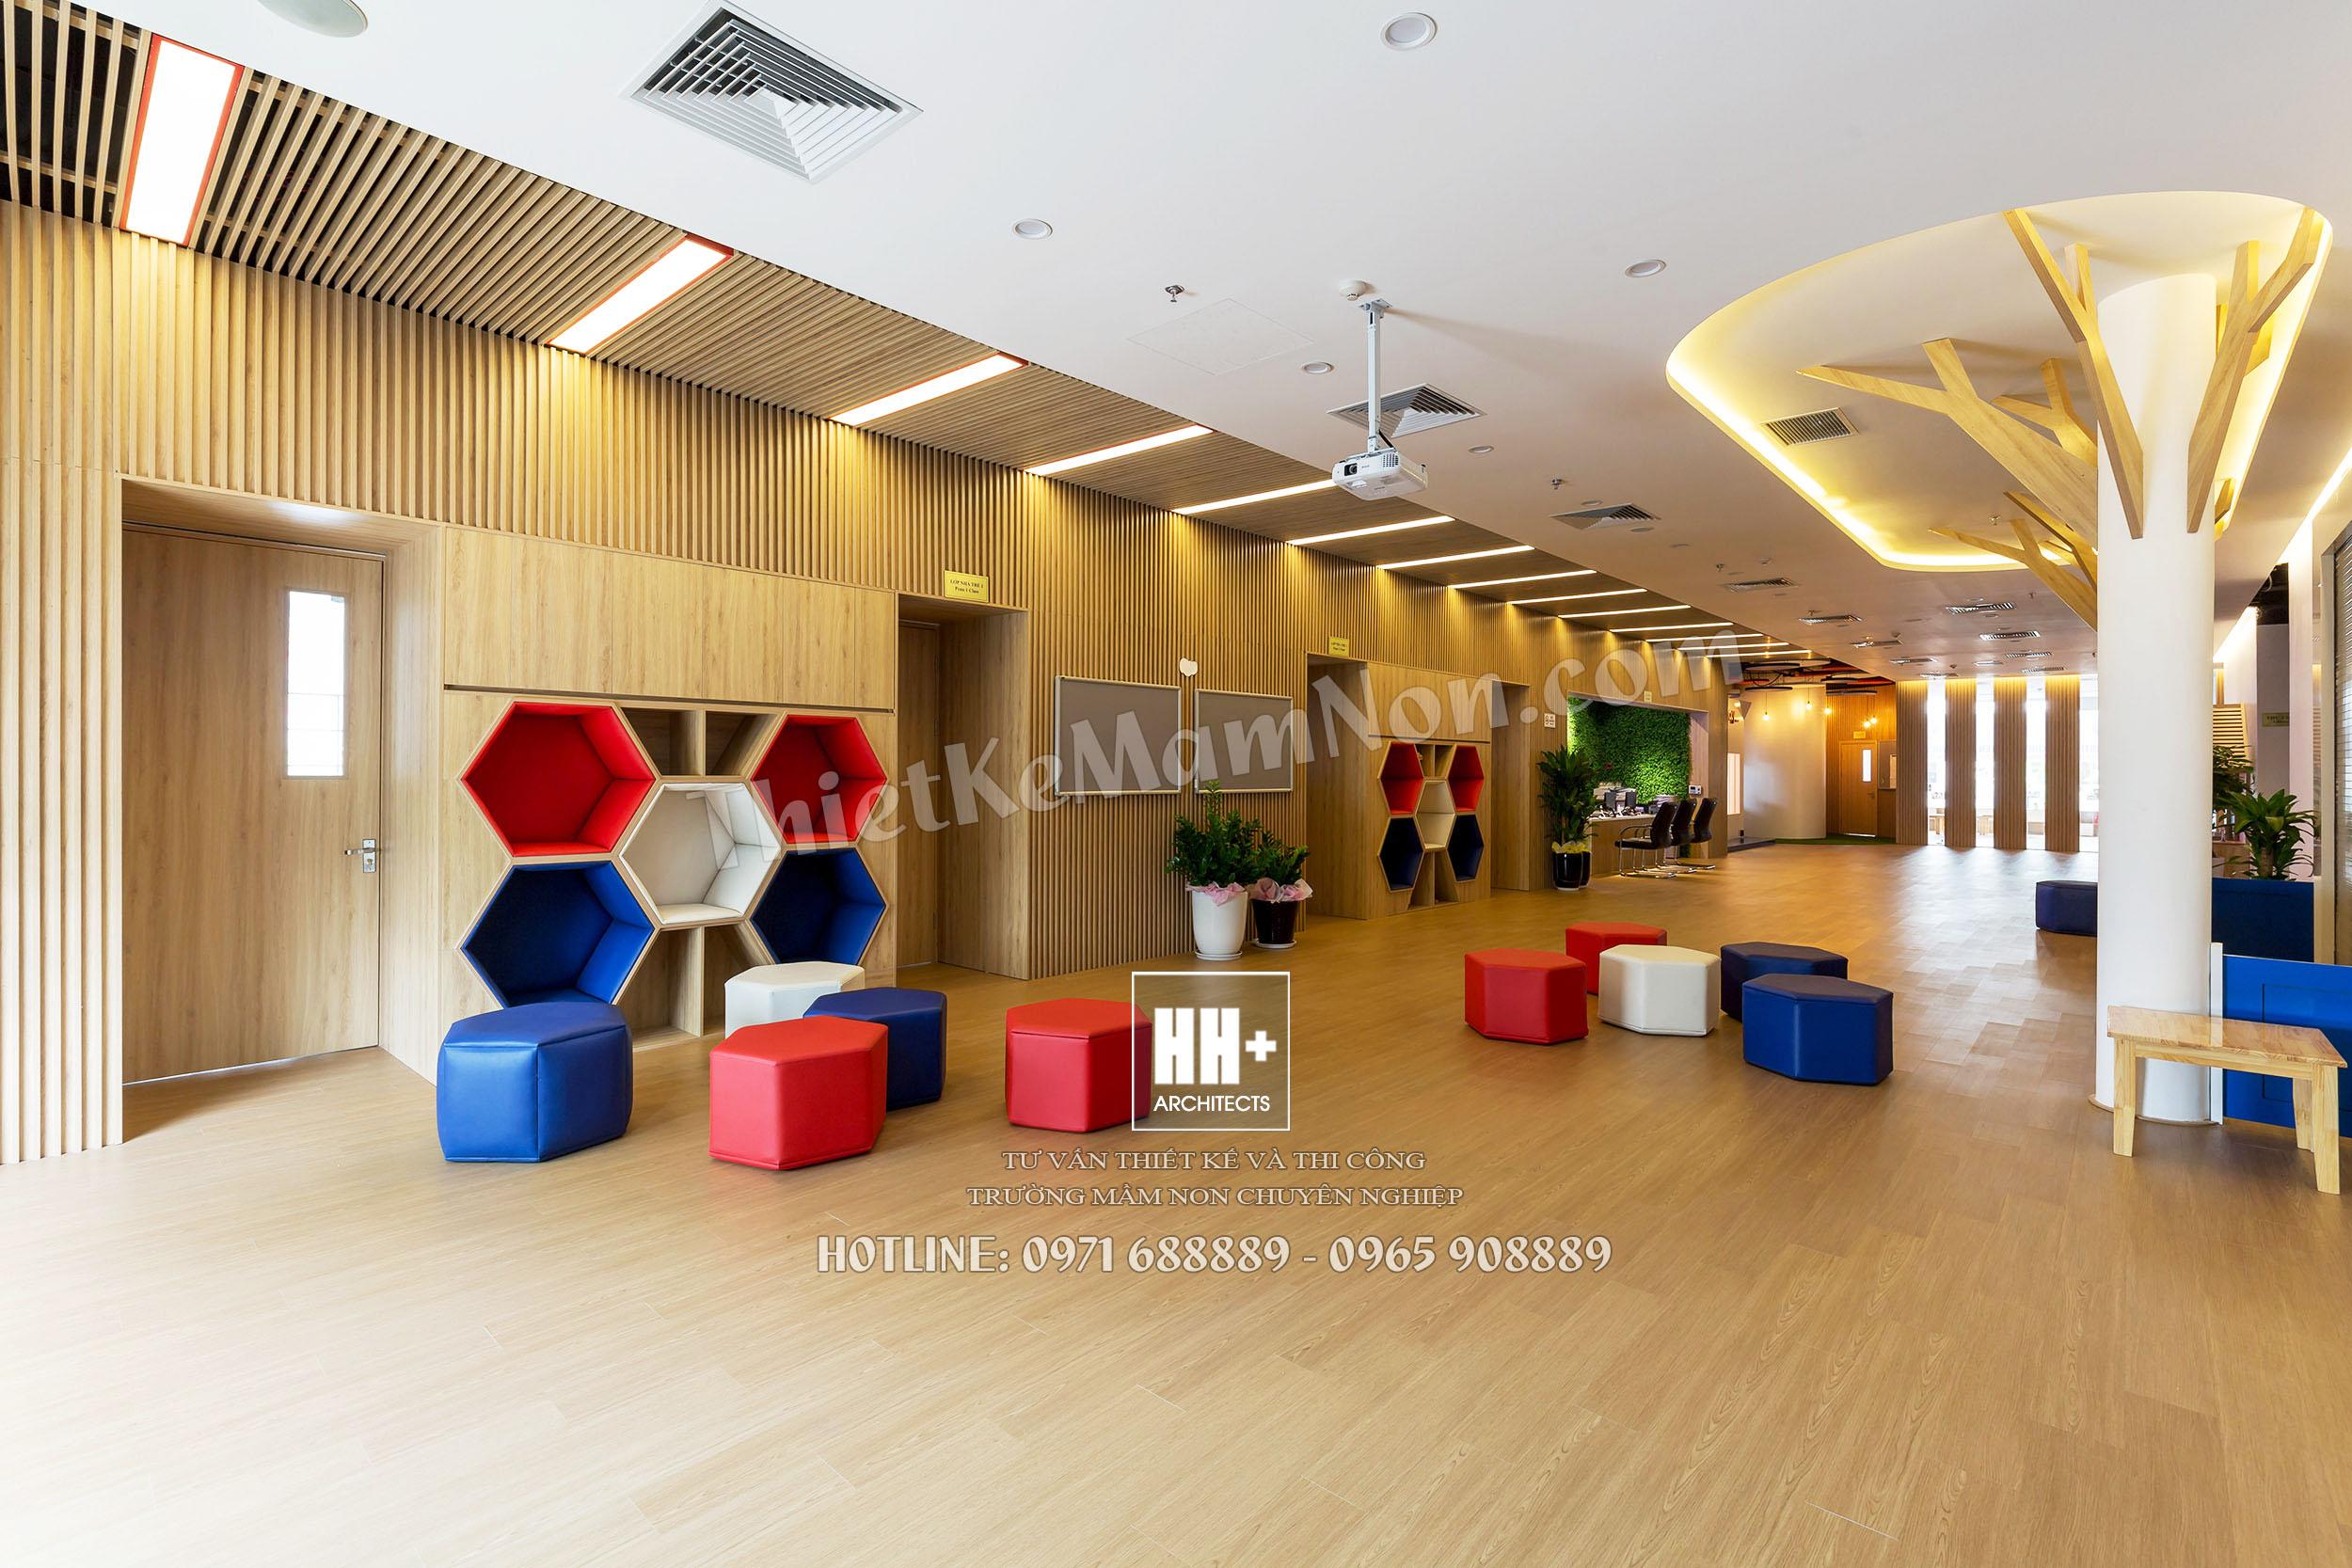 Rosemont_sinhhoatchung_01 thiết kế trường mầm non Thiết kế trường mầm non Quốc Tế MỸ ROSEMONT Rosemont sinhhoatchung 01